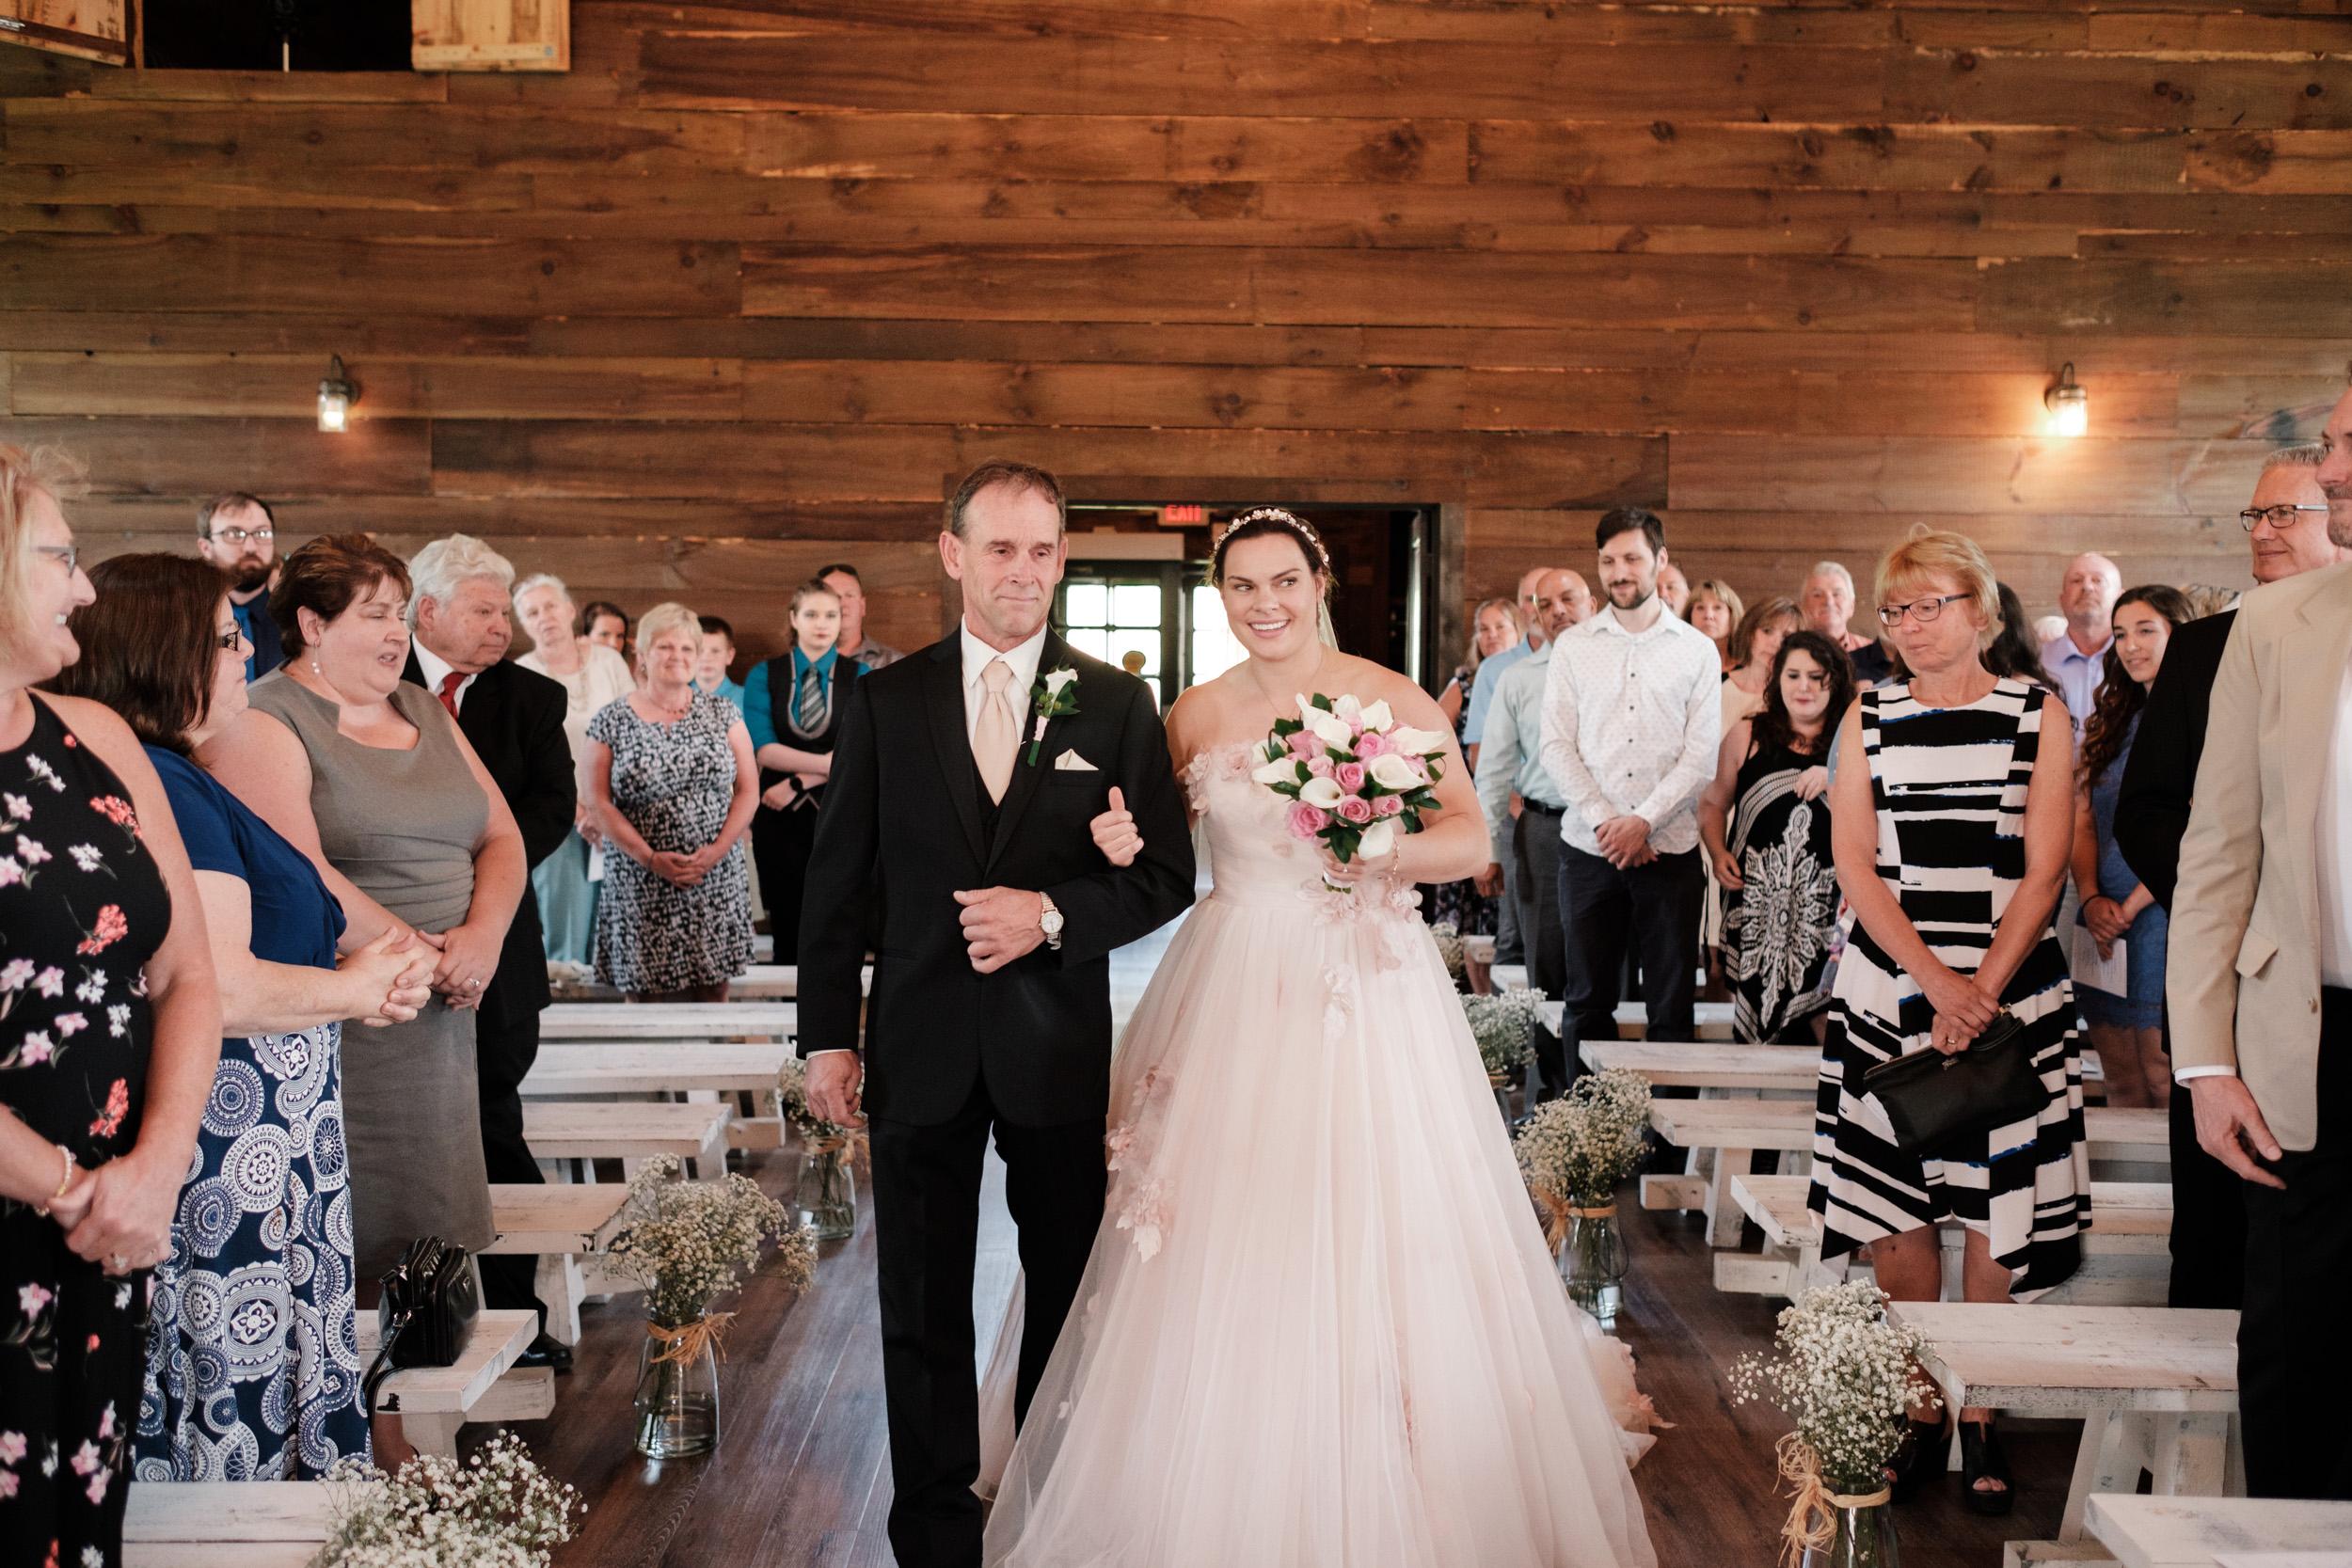 19-06-22-Ryan-Katie-The-Fields-Reserve-Wedding-21.jpg